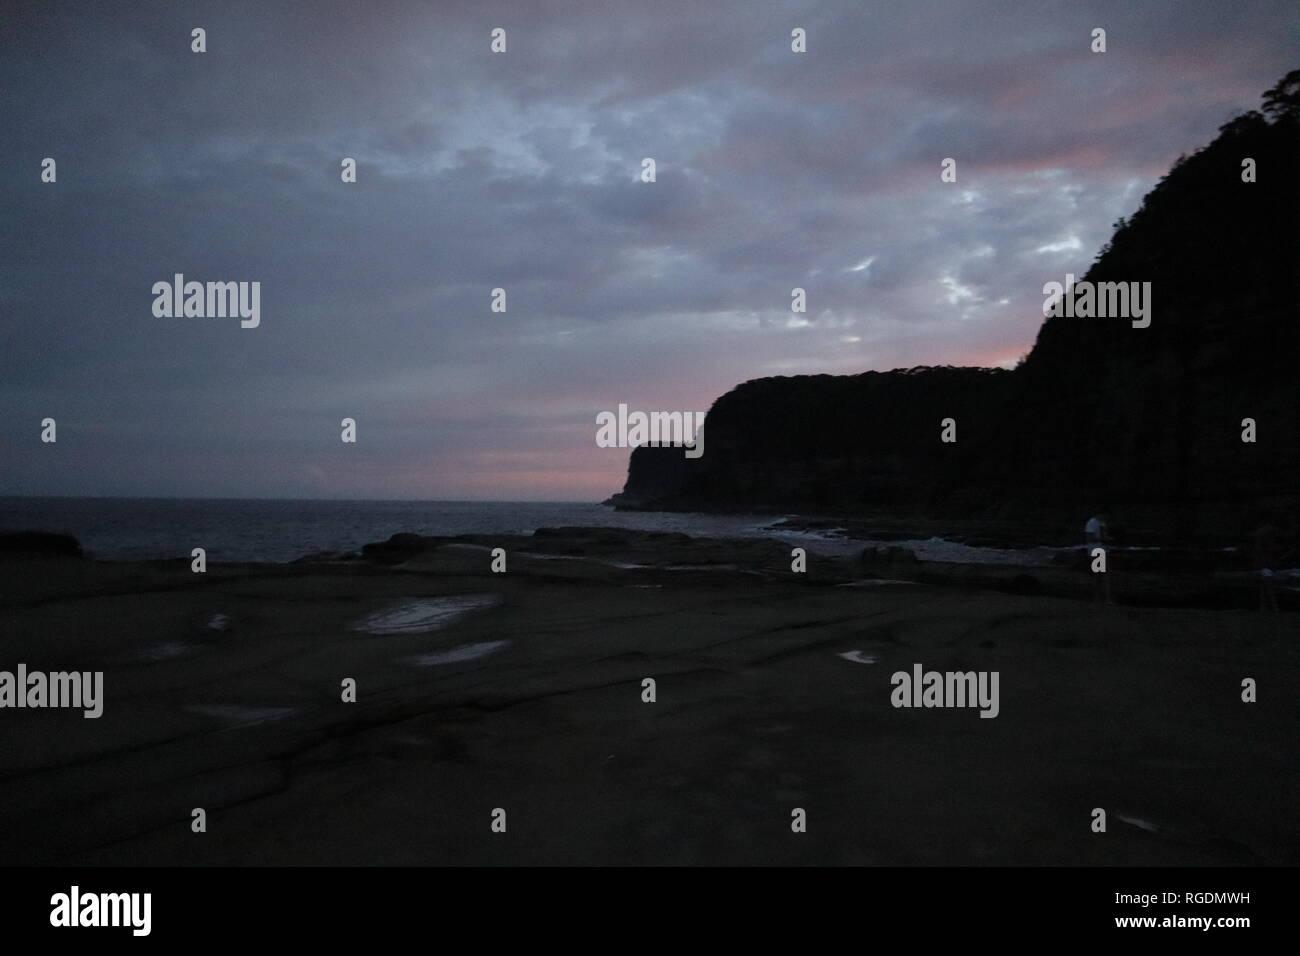 Sunset behind rocks - Stock Image